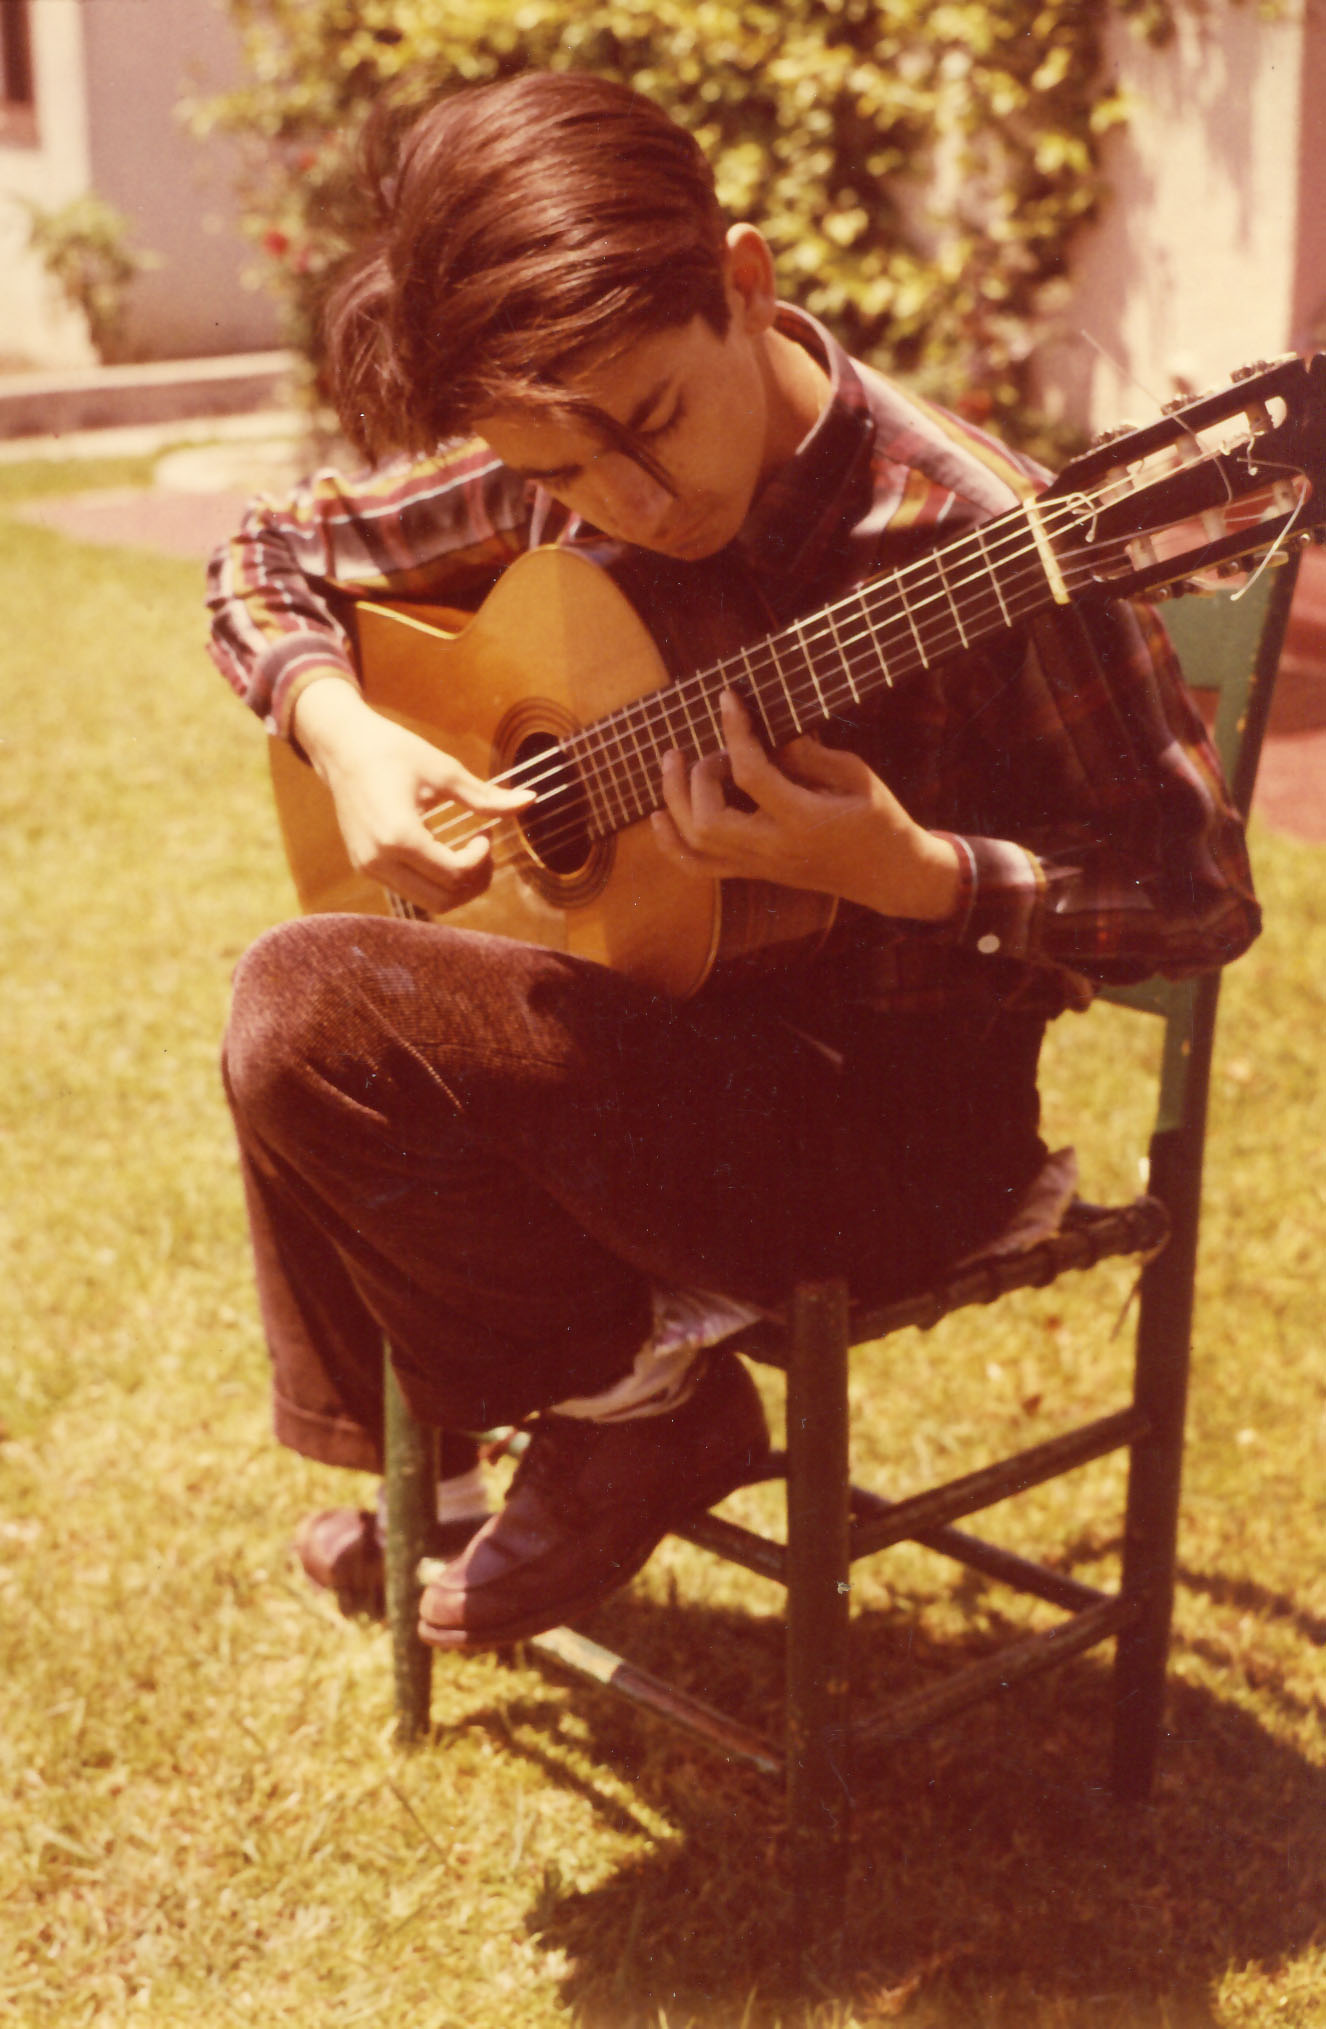 As a teenager in Santa Barbara 1958